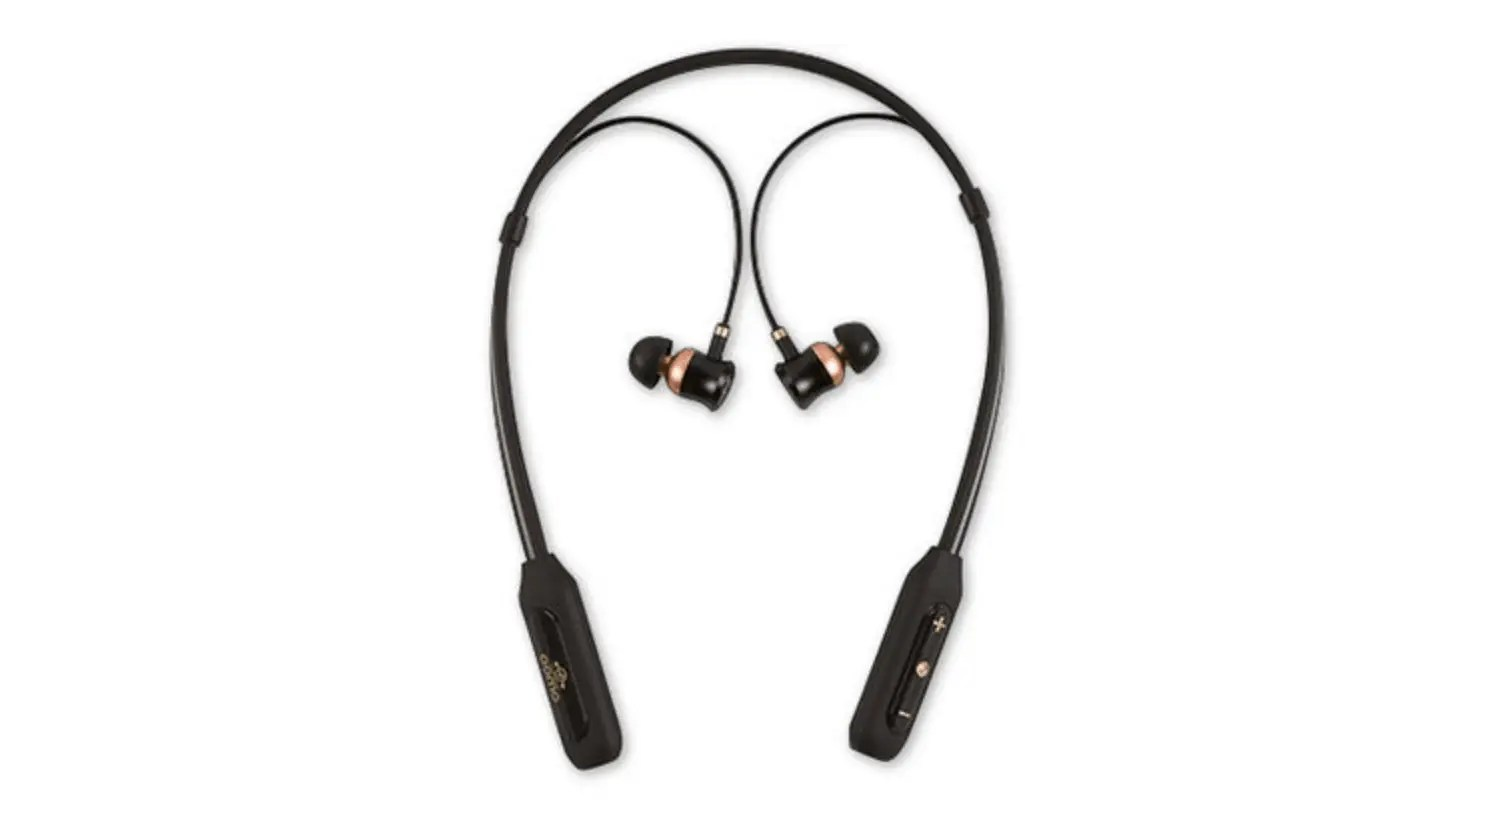 Buy The Oomo 3d 5 1 Virtual Surround Sound Earphones